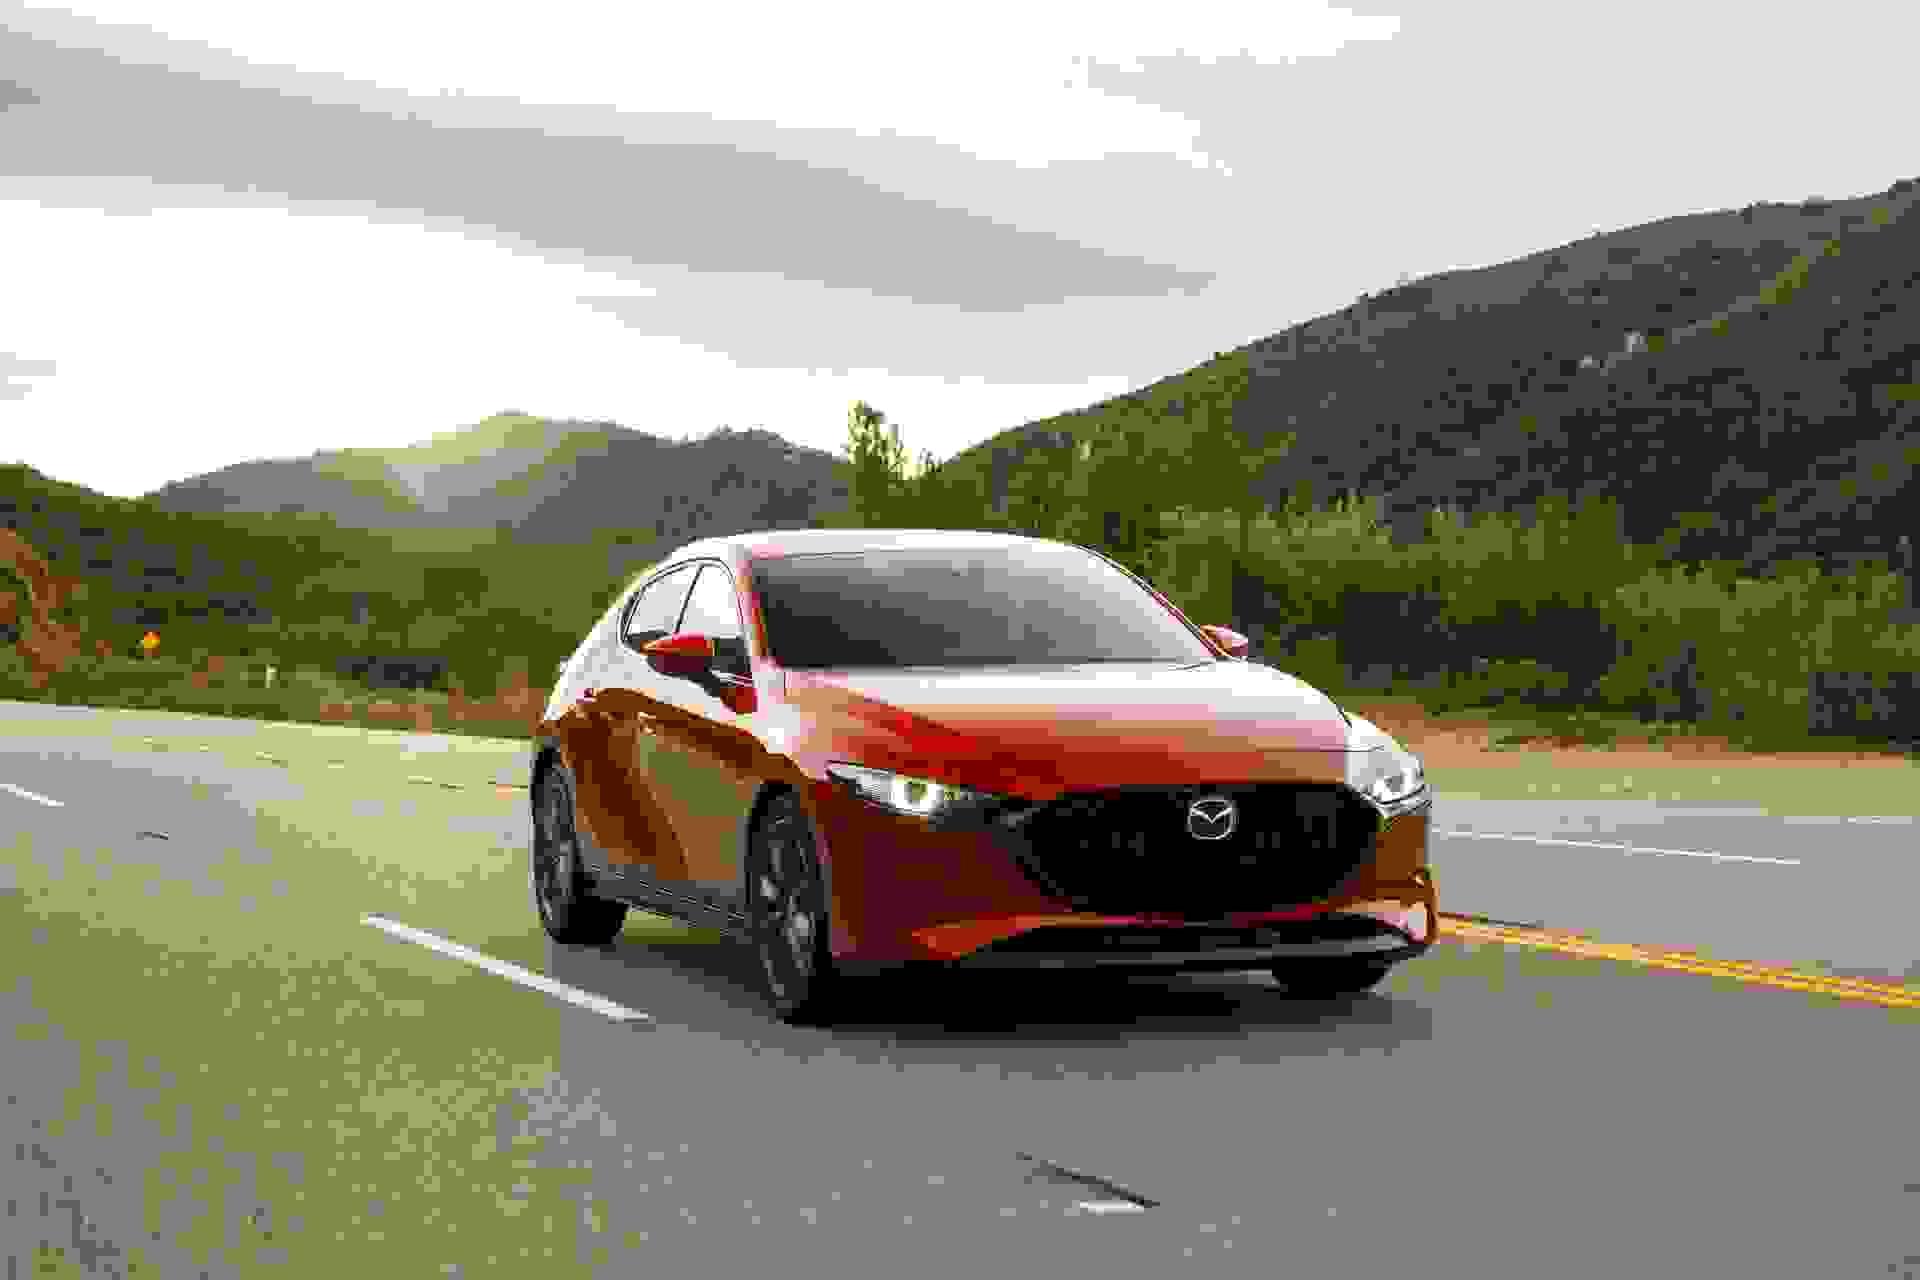 2019 Mazda3 Hatchback 13 (1)